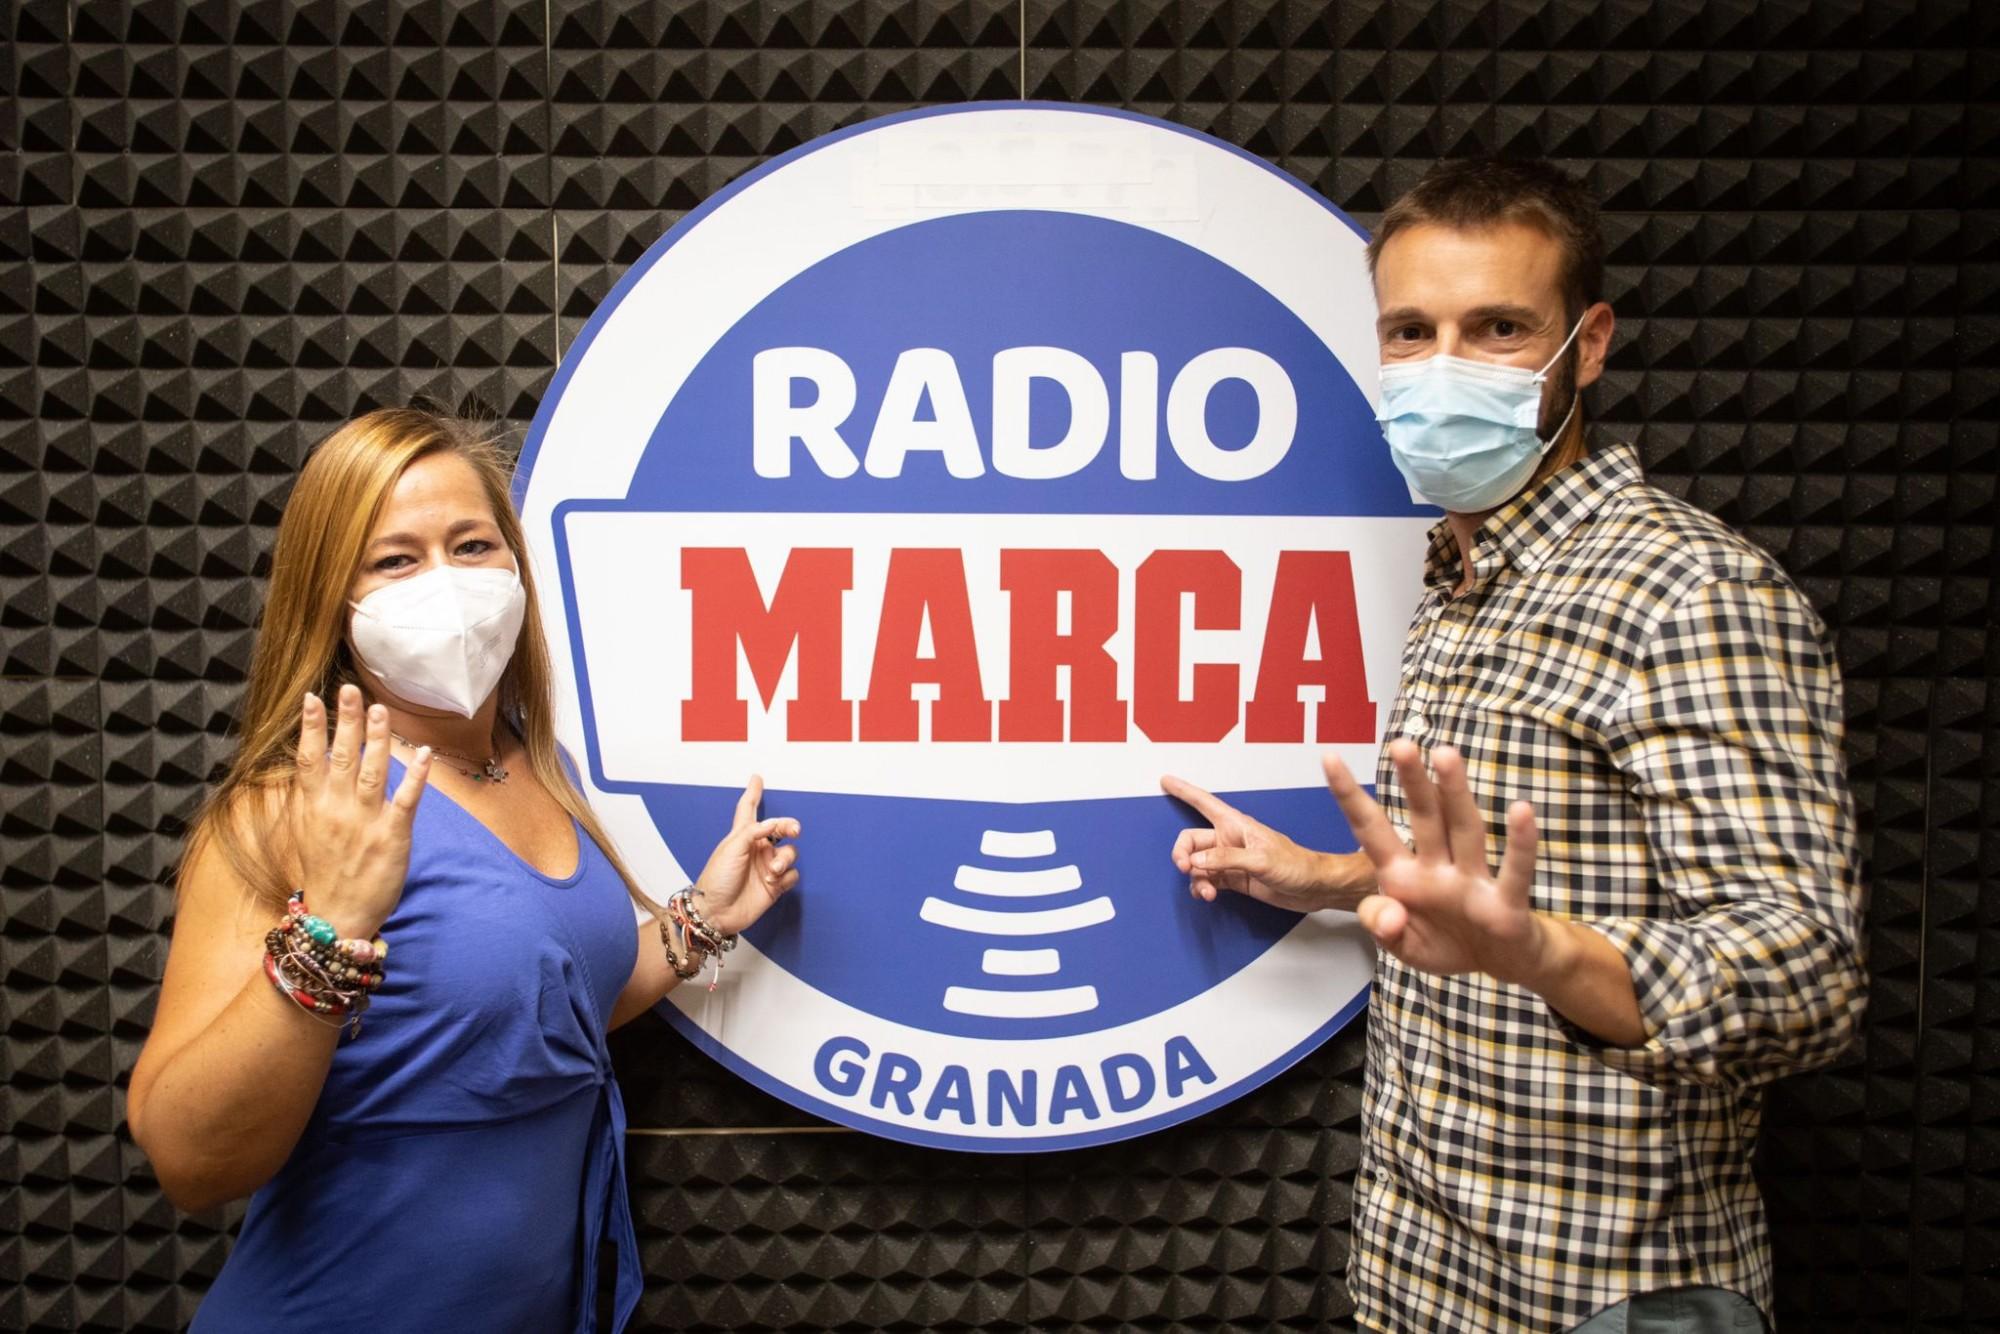 patricia-rodriguez-radio-marca-granada